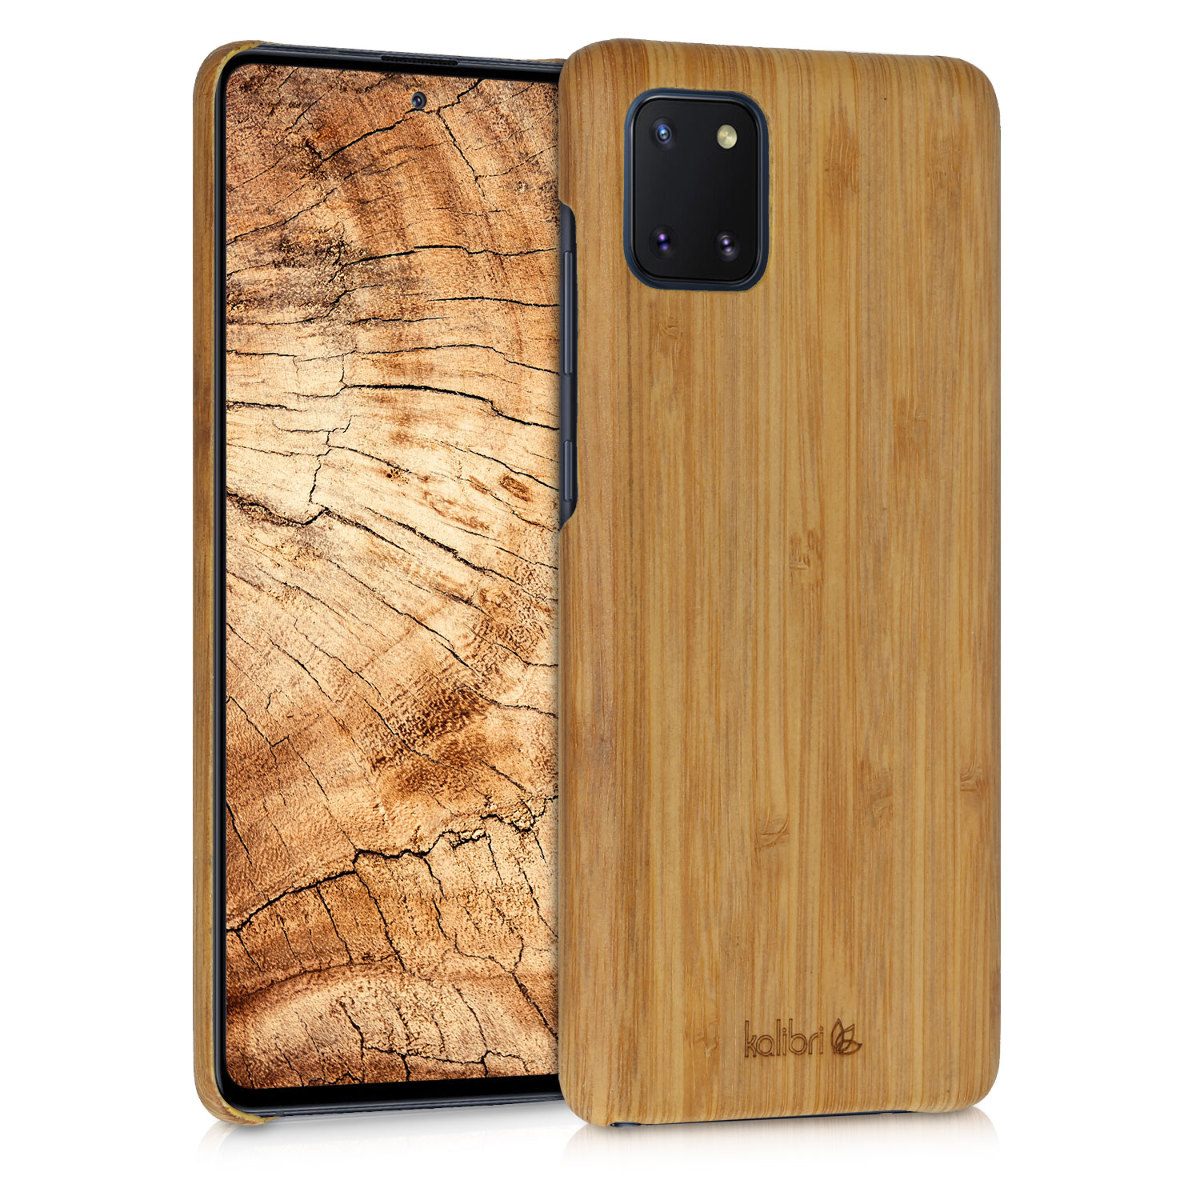 Kalibri Σκληρή Ξύλινη Θήκη Samsung Galaxy Note 10 Lite - Light Brown (51415.24)